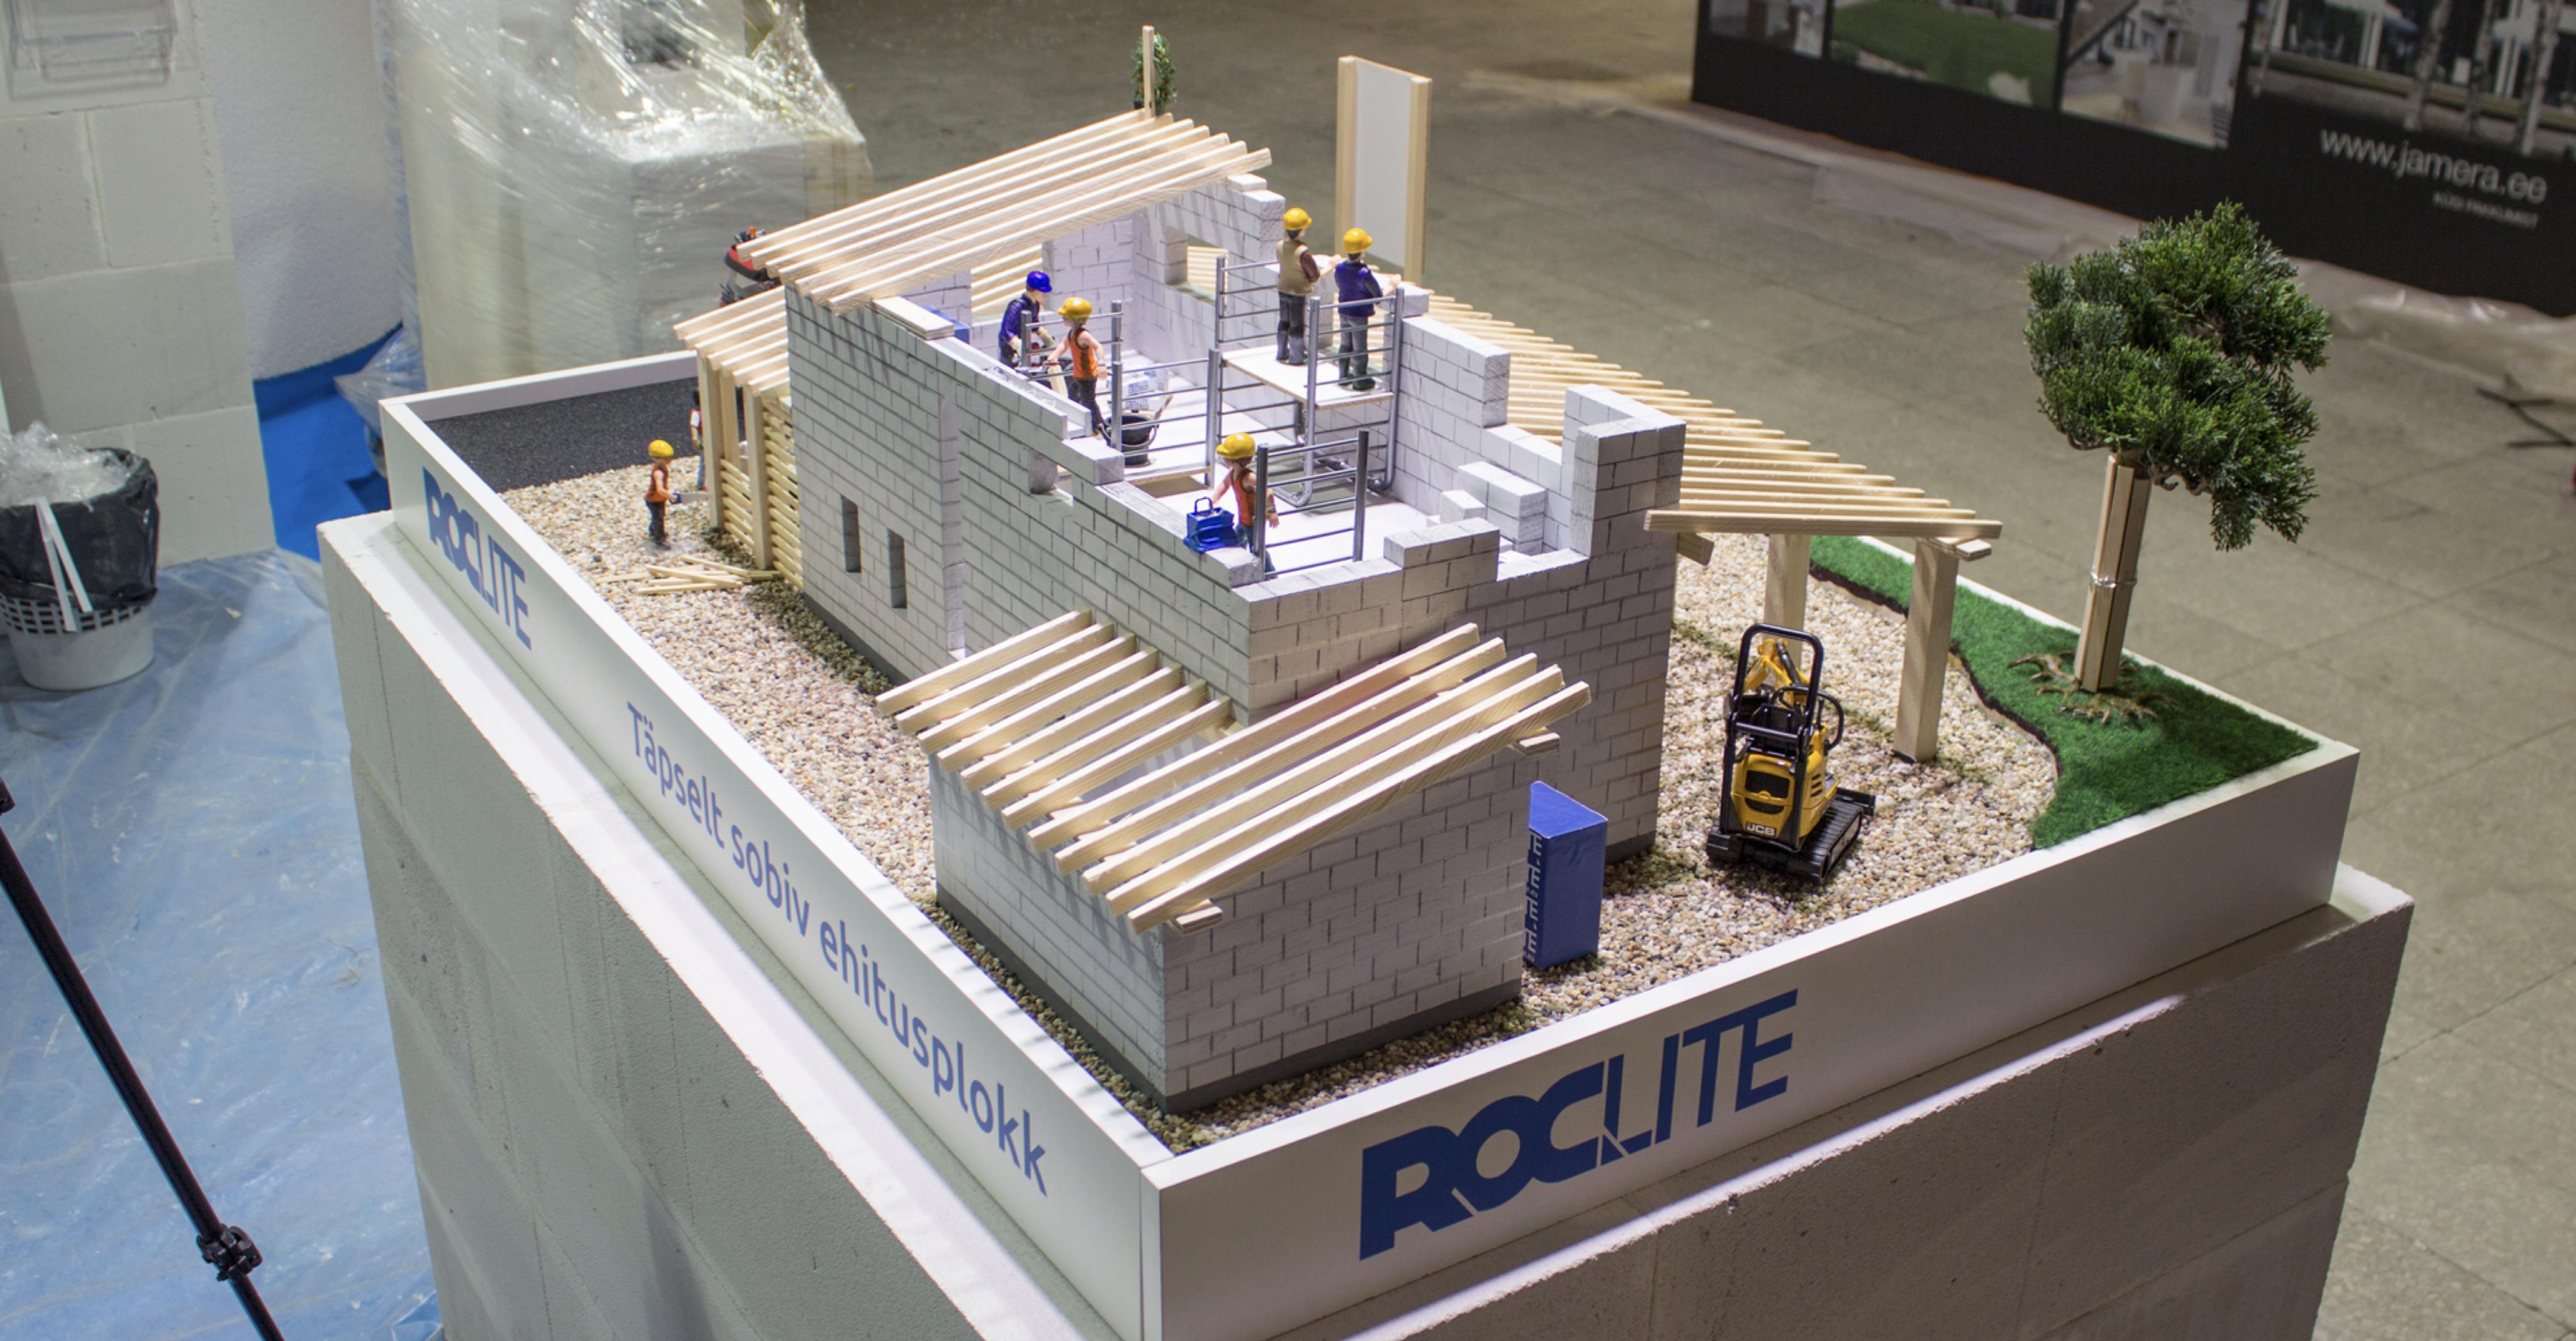 Makett: Roclite Ehitusmessil